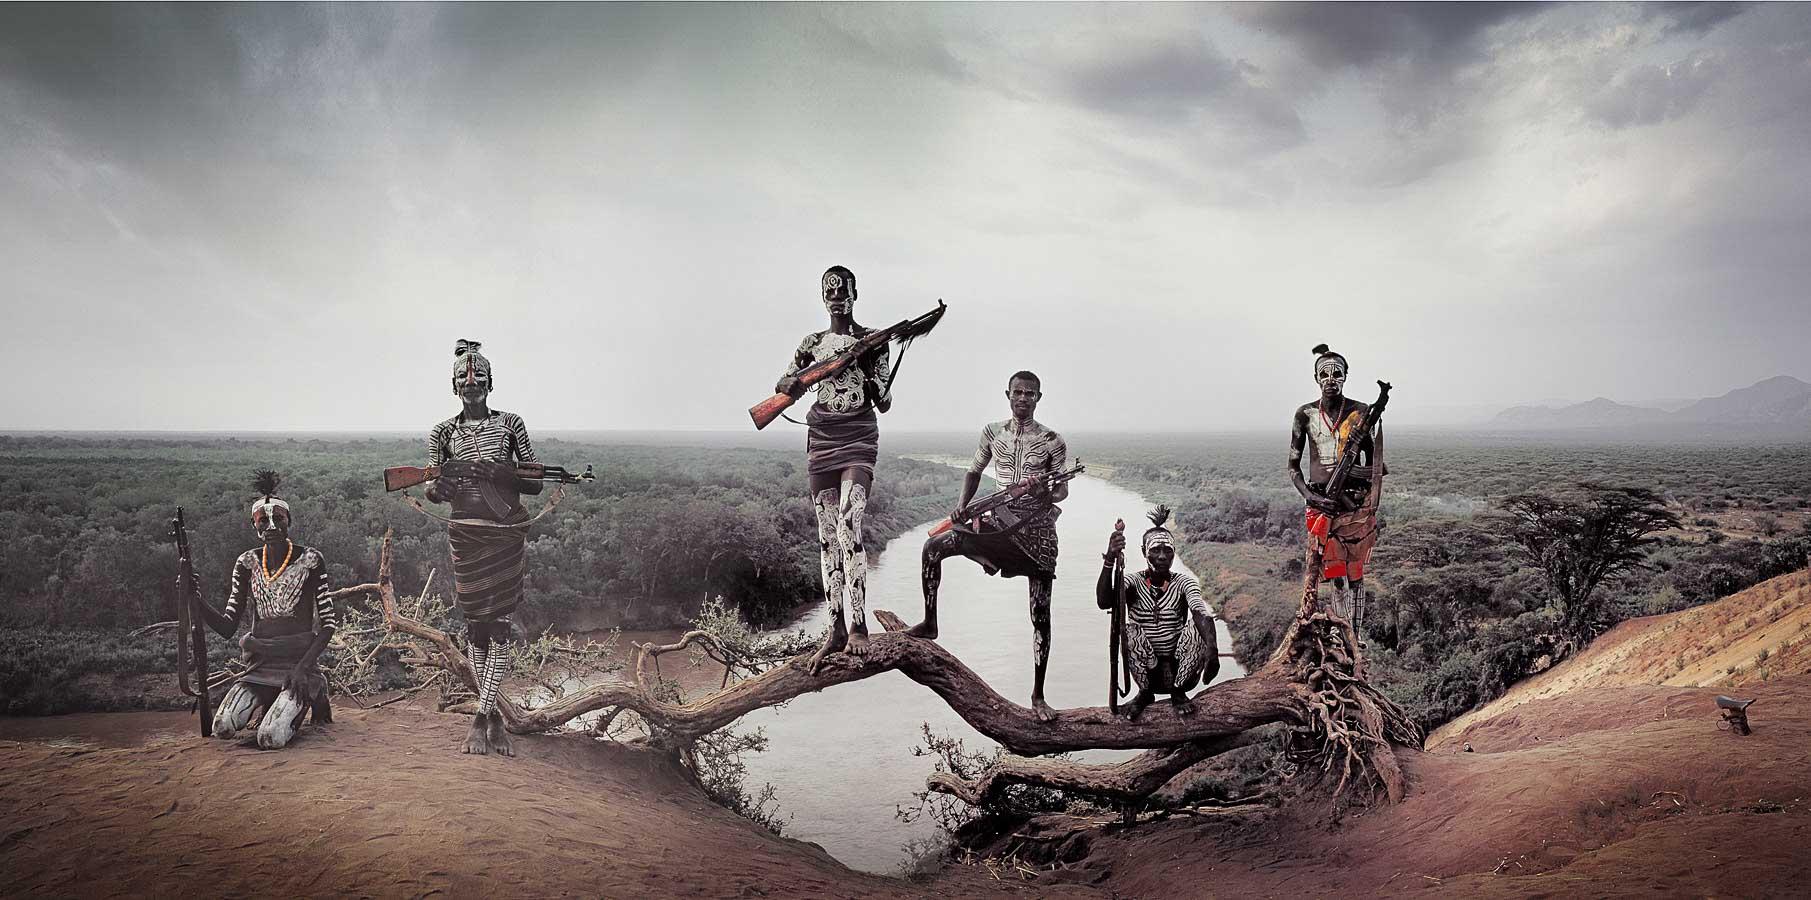 Karo - Ethiopie Photo : Jimmy Nelson